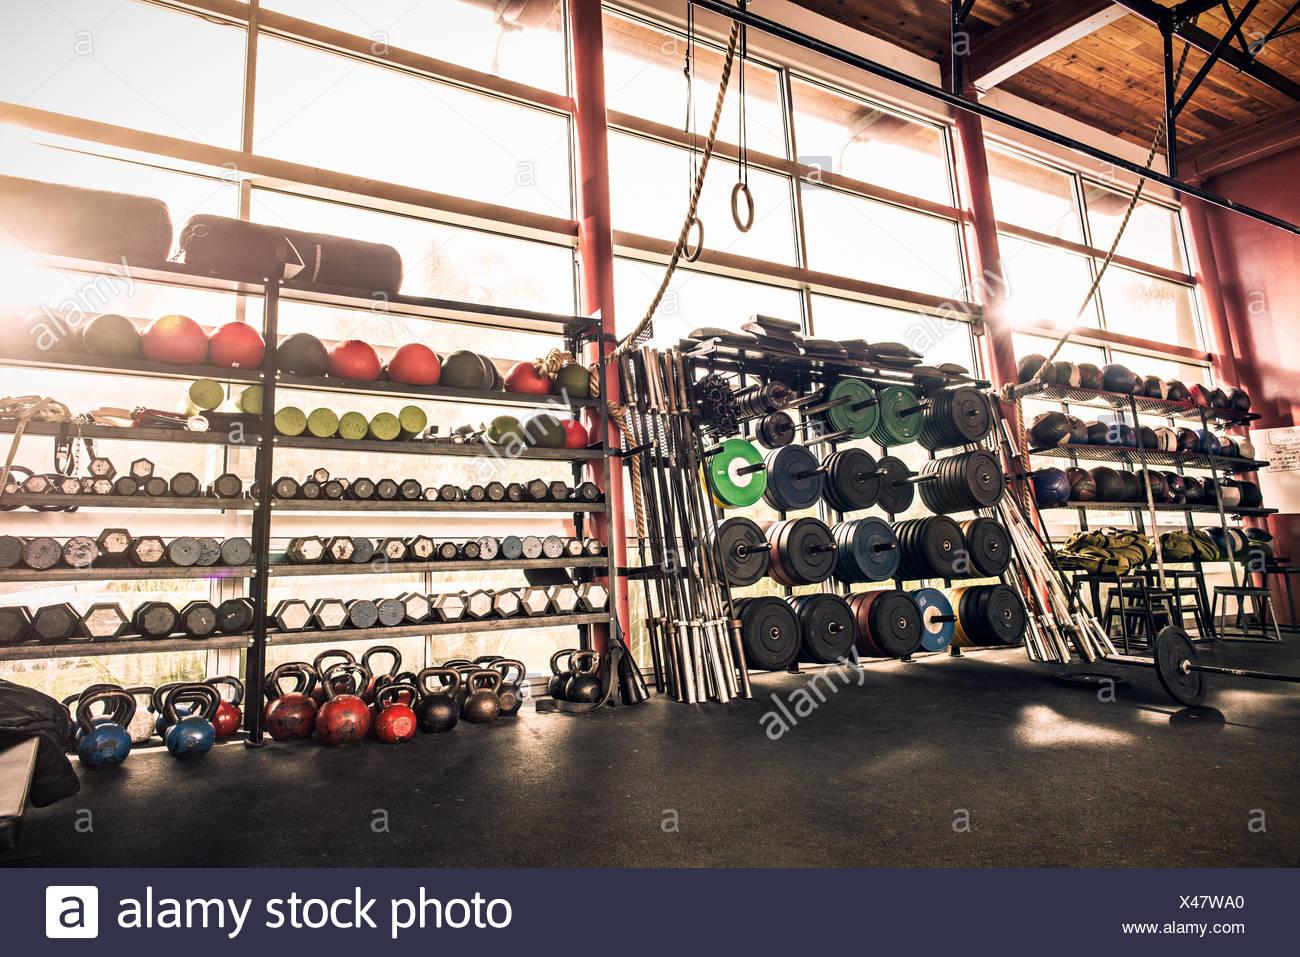 Gym equipment - weights, gym balls, kettle bells - Stock Image